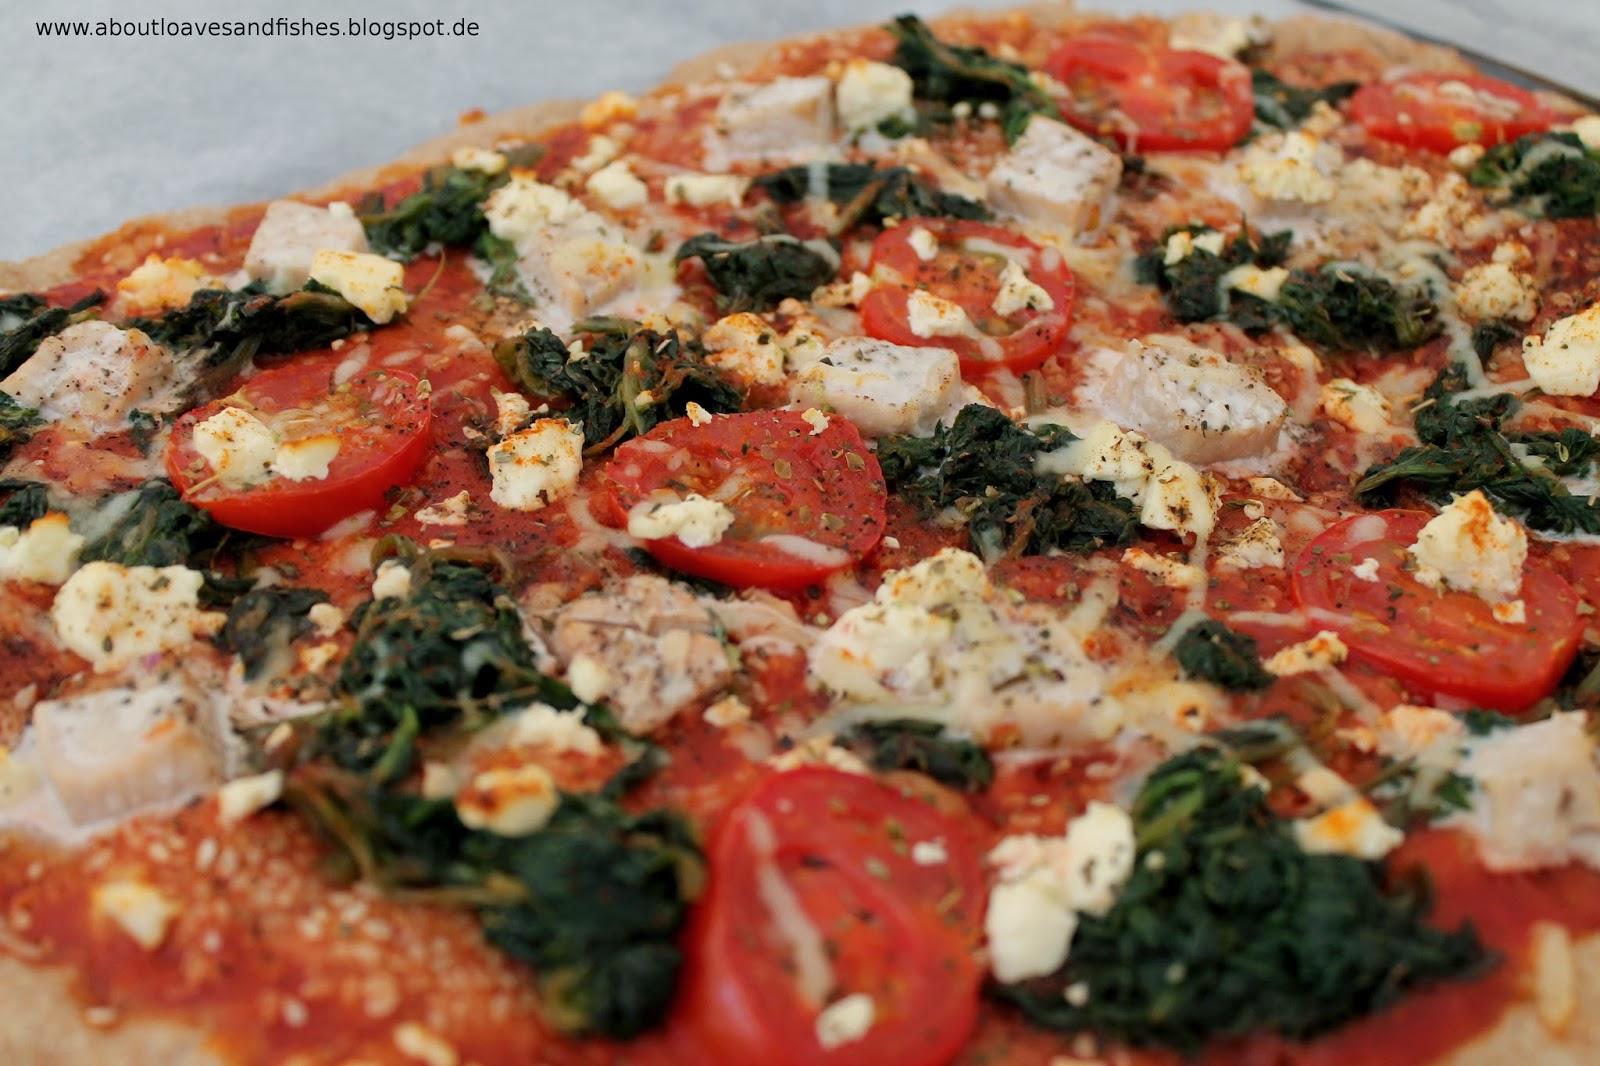 Sesampizza mit Lachs, Spinat und Feta